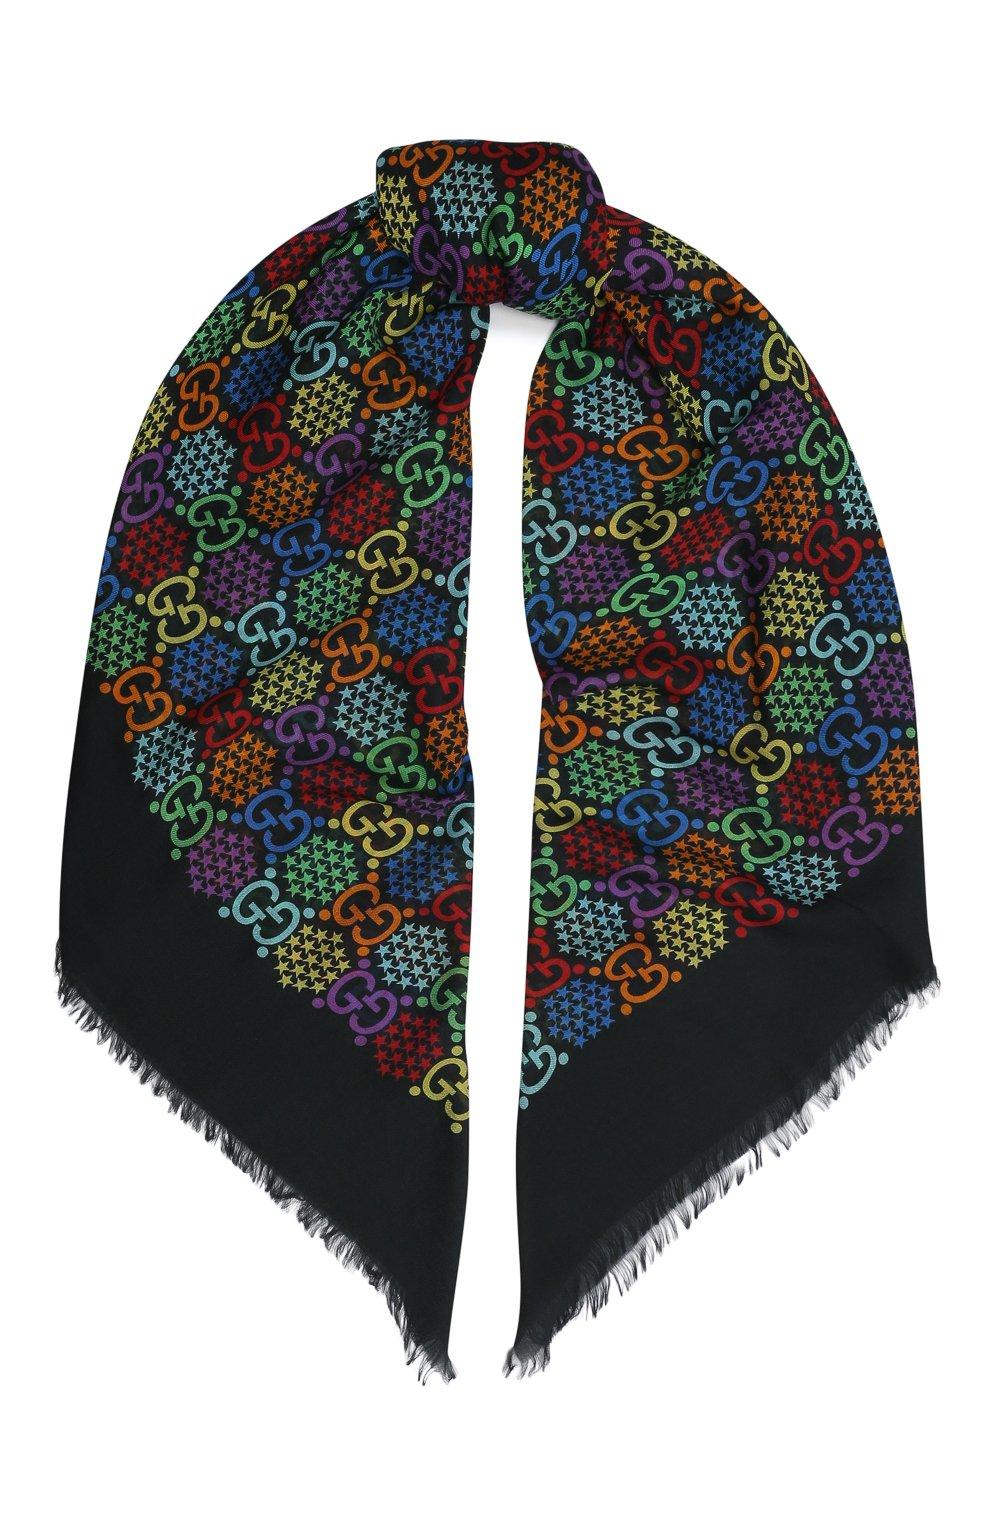 Мужской шарф gg psychedelic GUCCI разноцветного цвета, арт. 600975/4G865   Фото 1